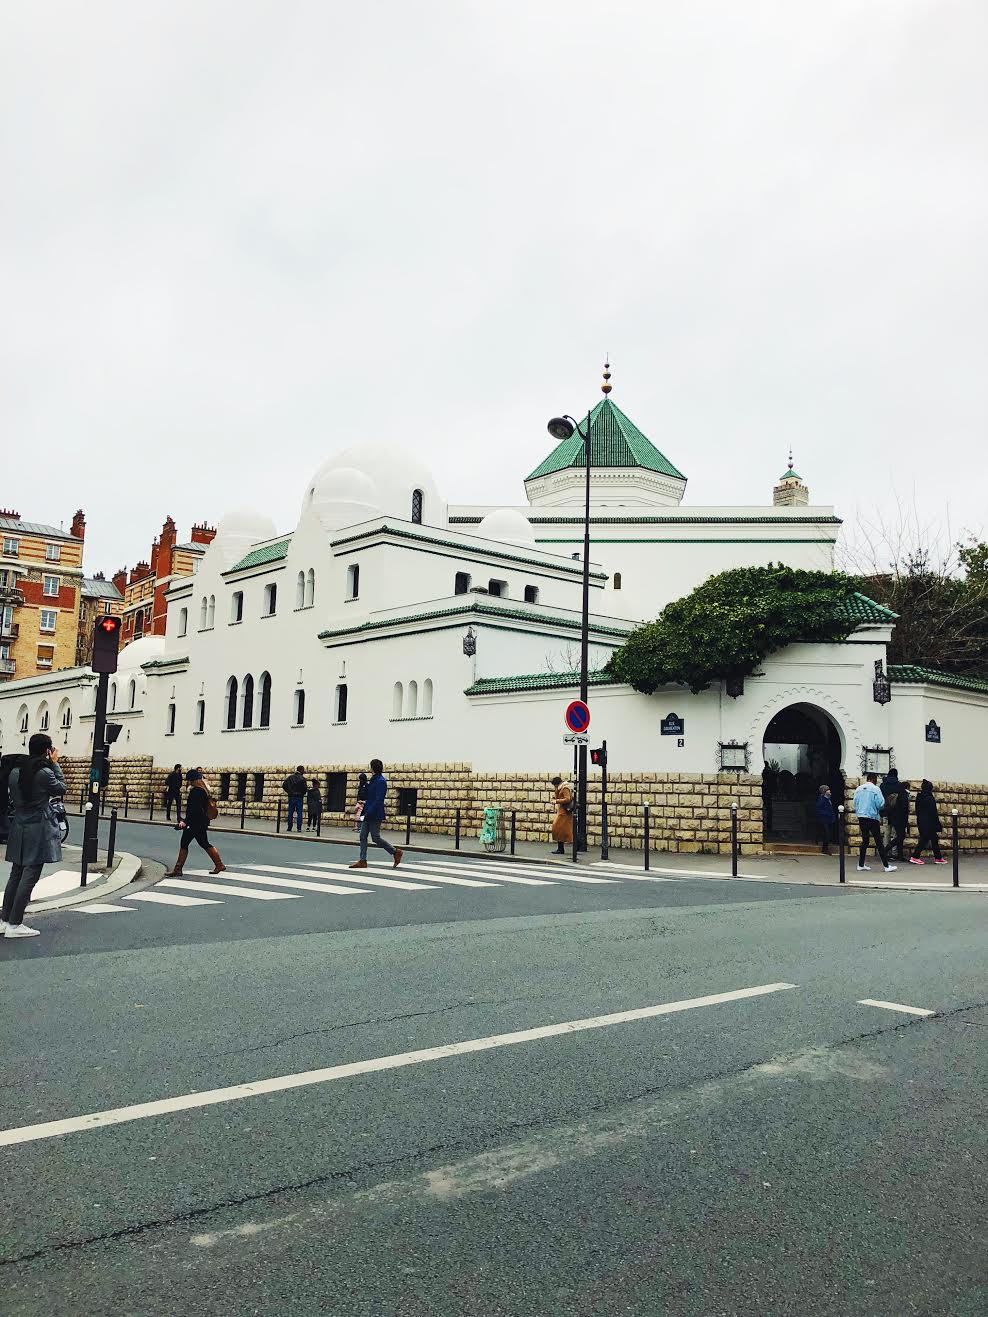 Muslim-travel-guide-Paris-Grand-Mosque-of-Paris.jpg